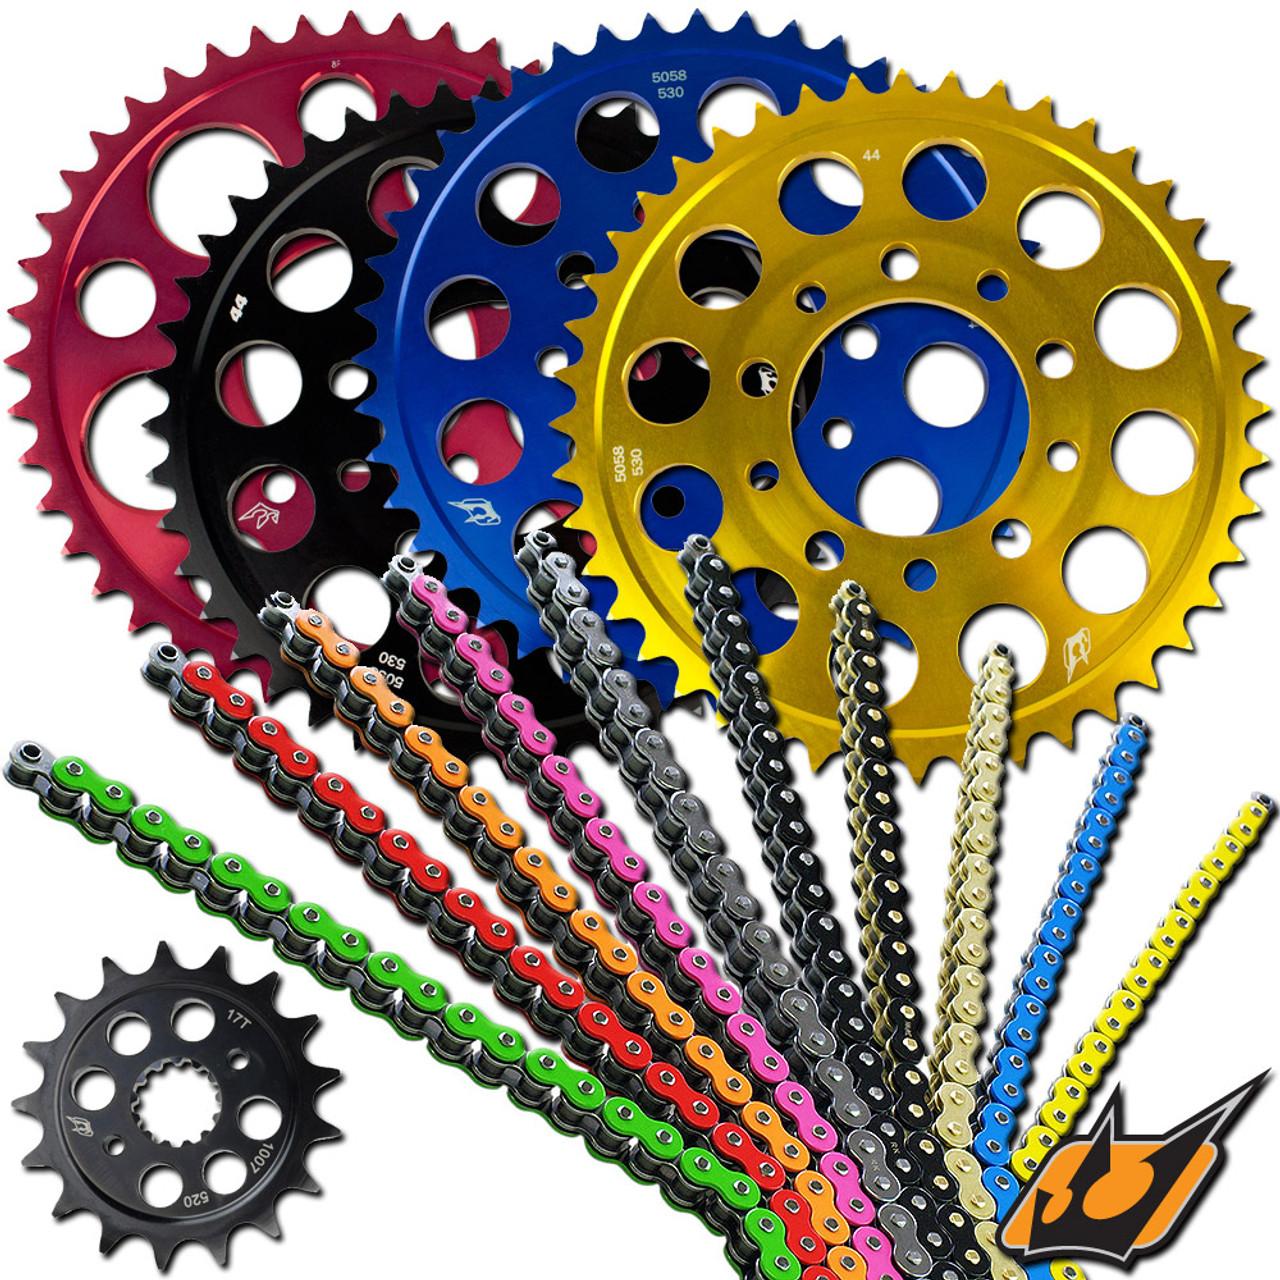 Color: Natural Driven Racing 520 Steel Rear Sprocket Material: Steel Sprocket Teeth: 47 Sprocket Position: Rear Sprocket Size: 520 47T